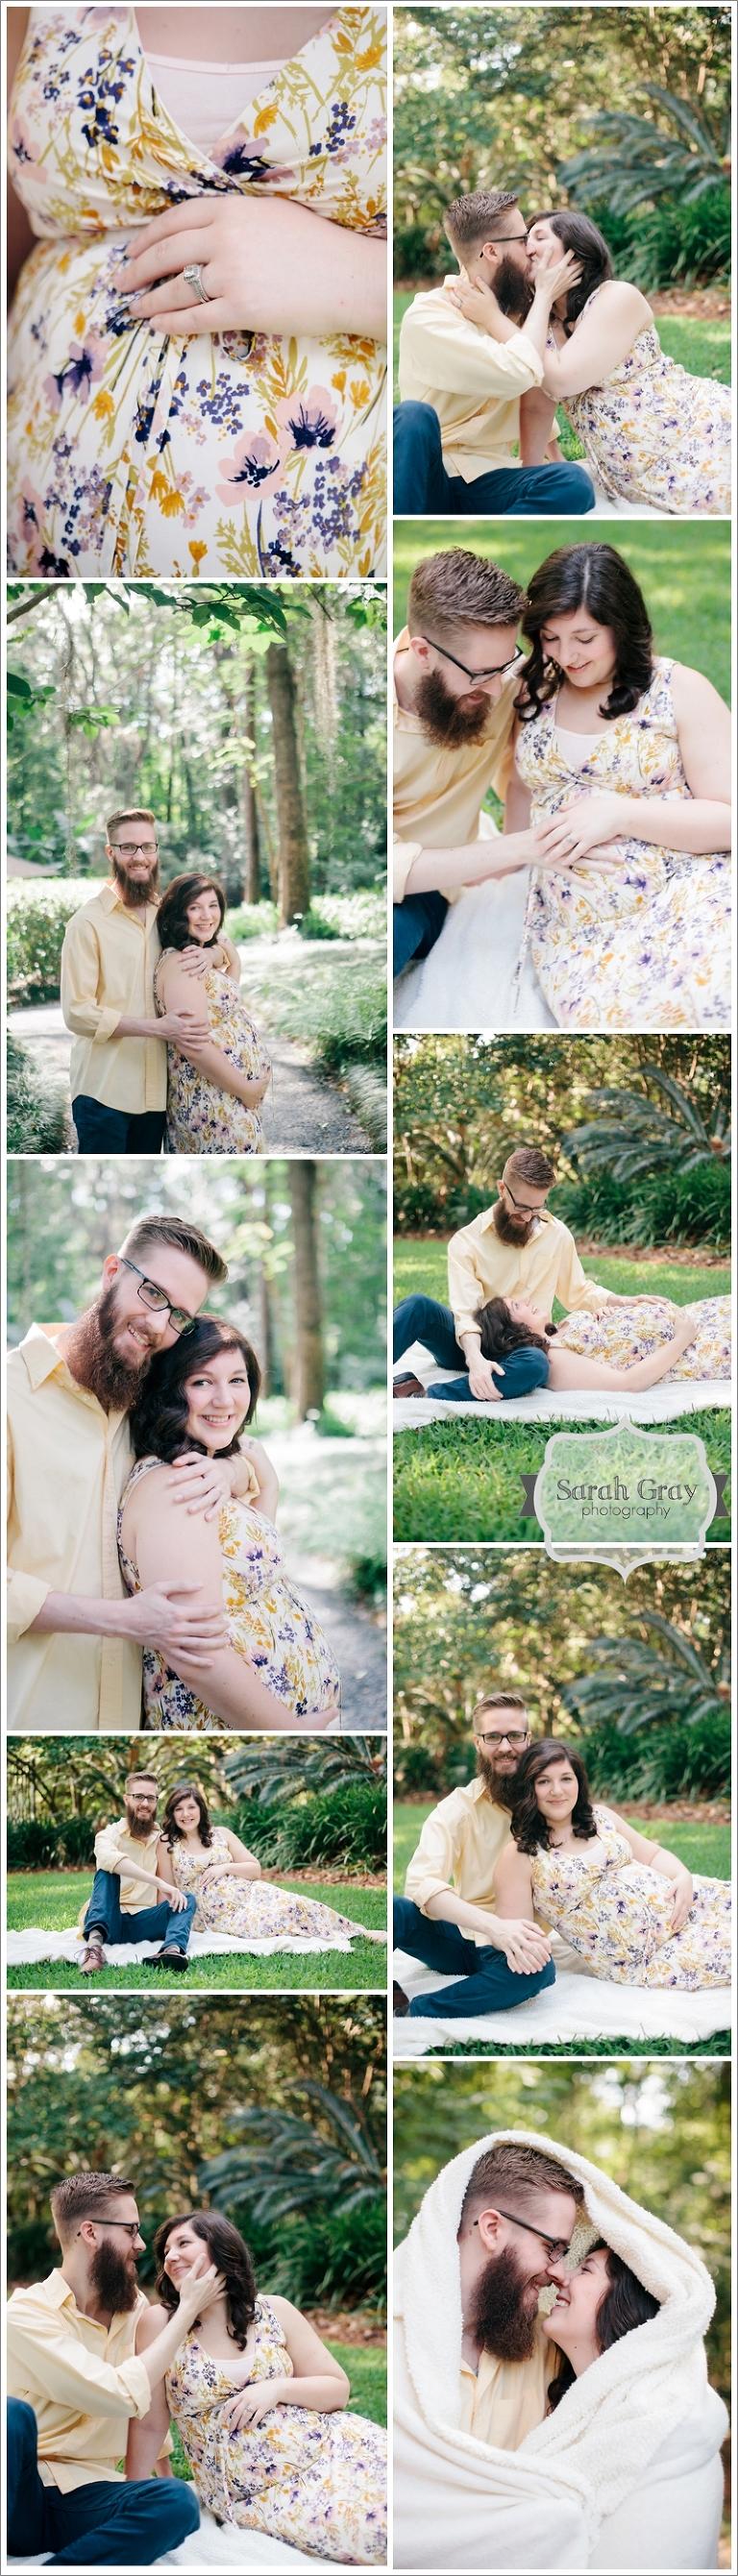 Sarah Gray Photography | Tallahassee, Fl Maternity, Newborn, Family Photogrpaher